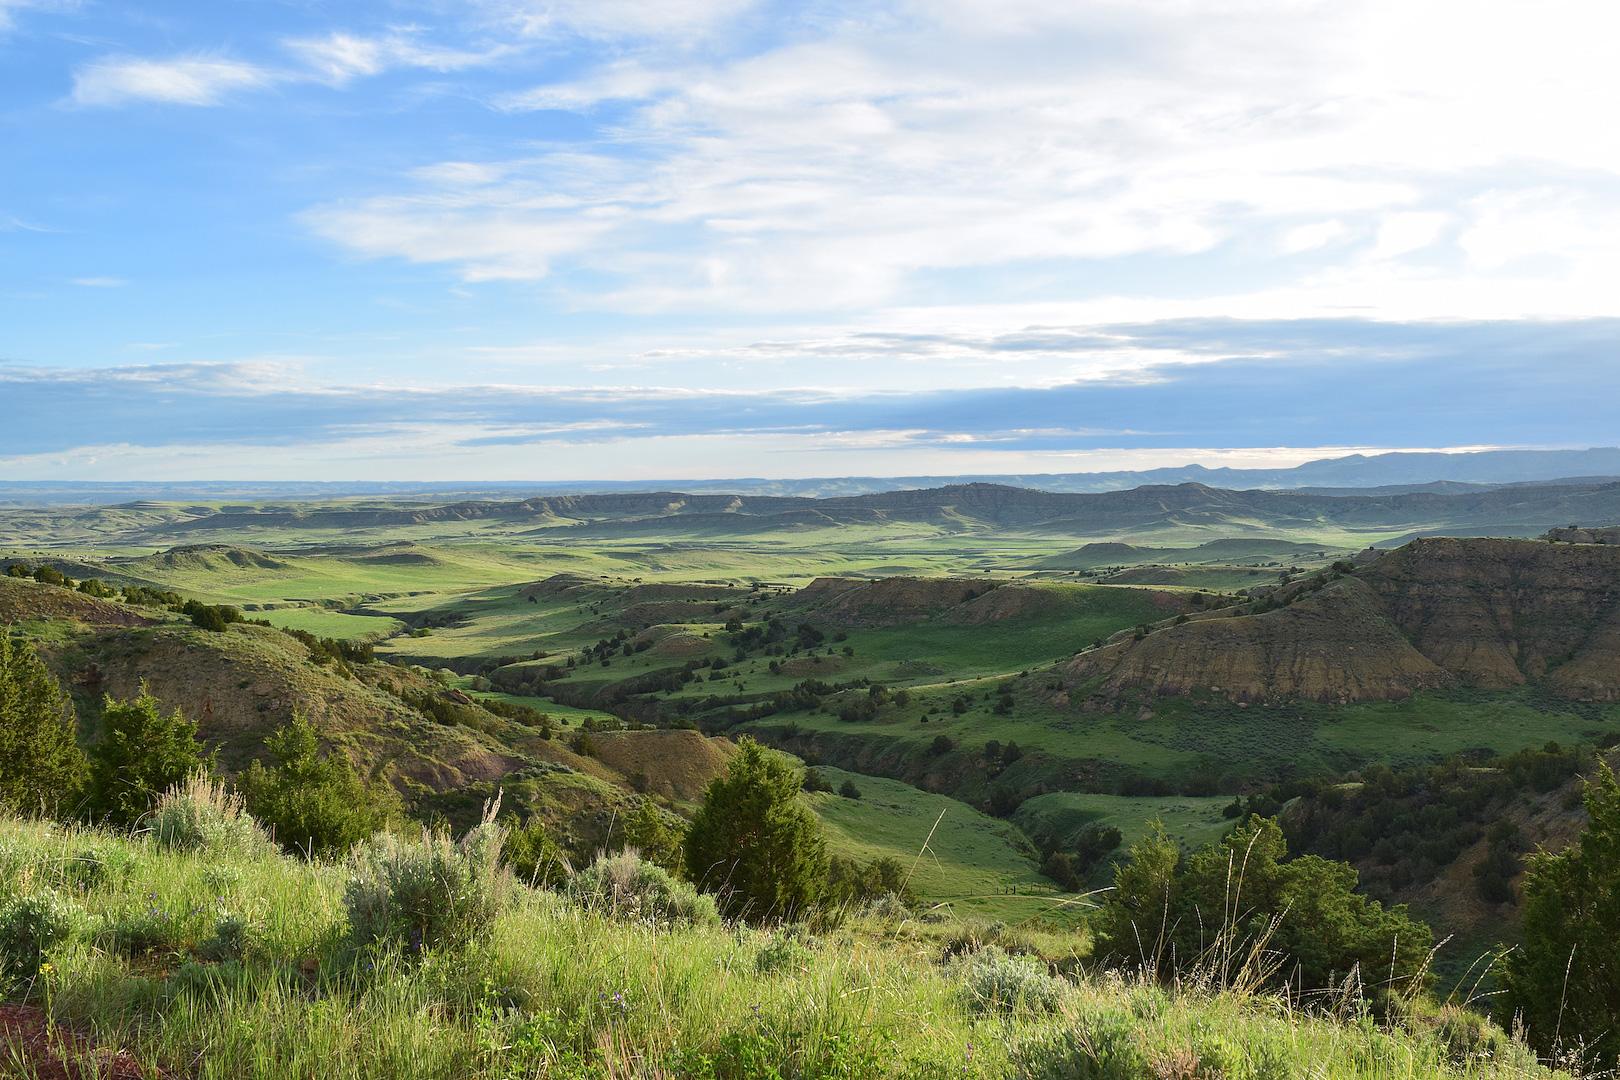 Brinkerhoff Ranch